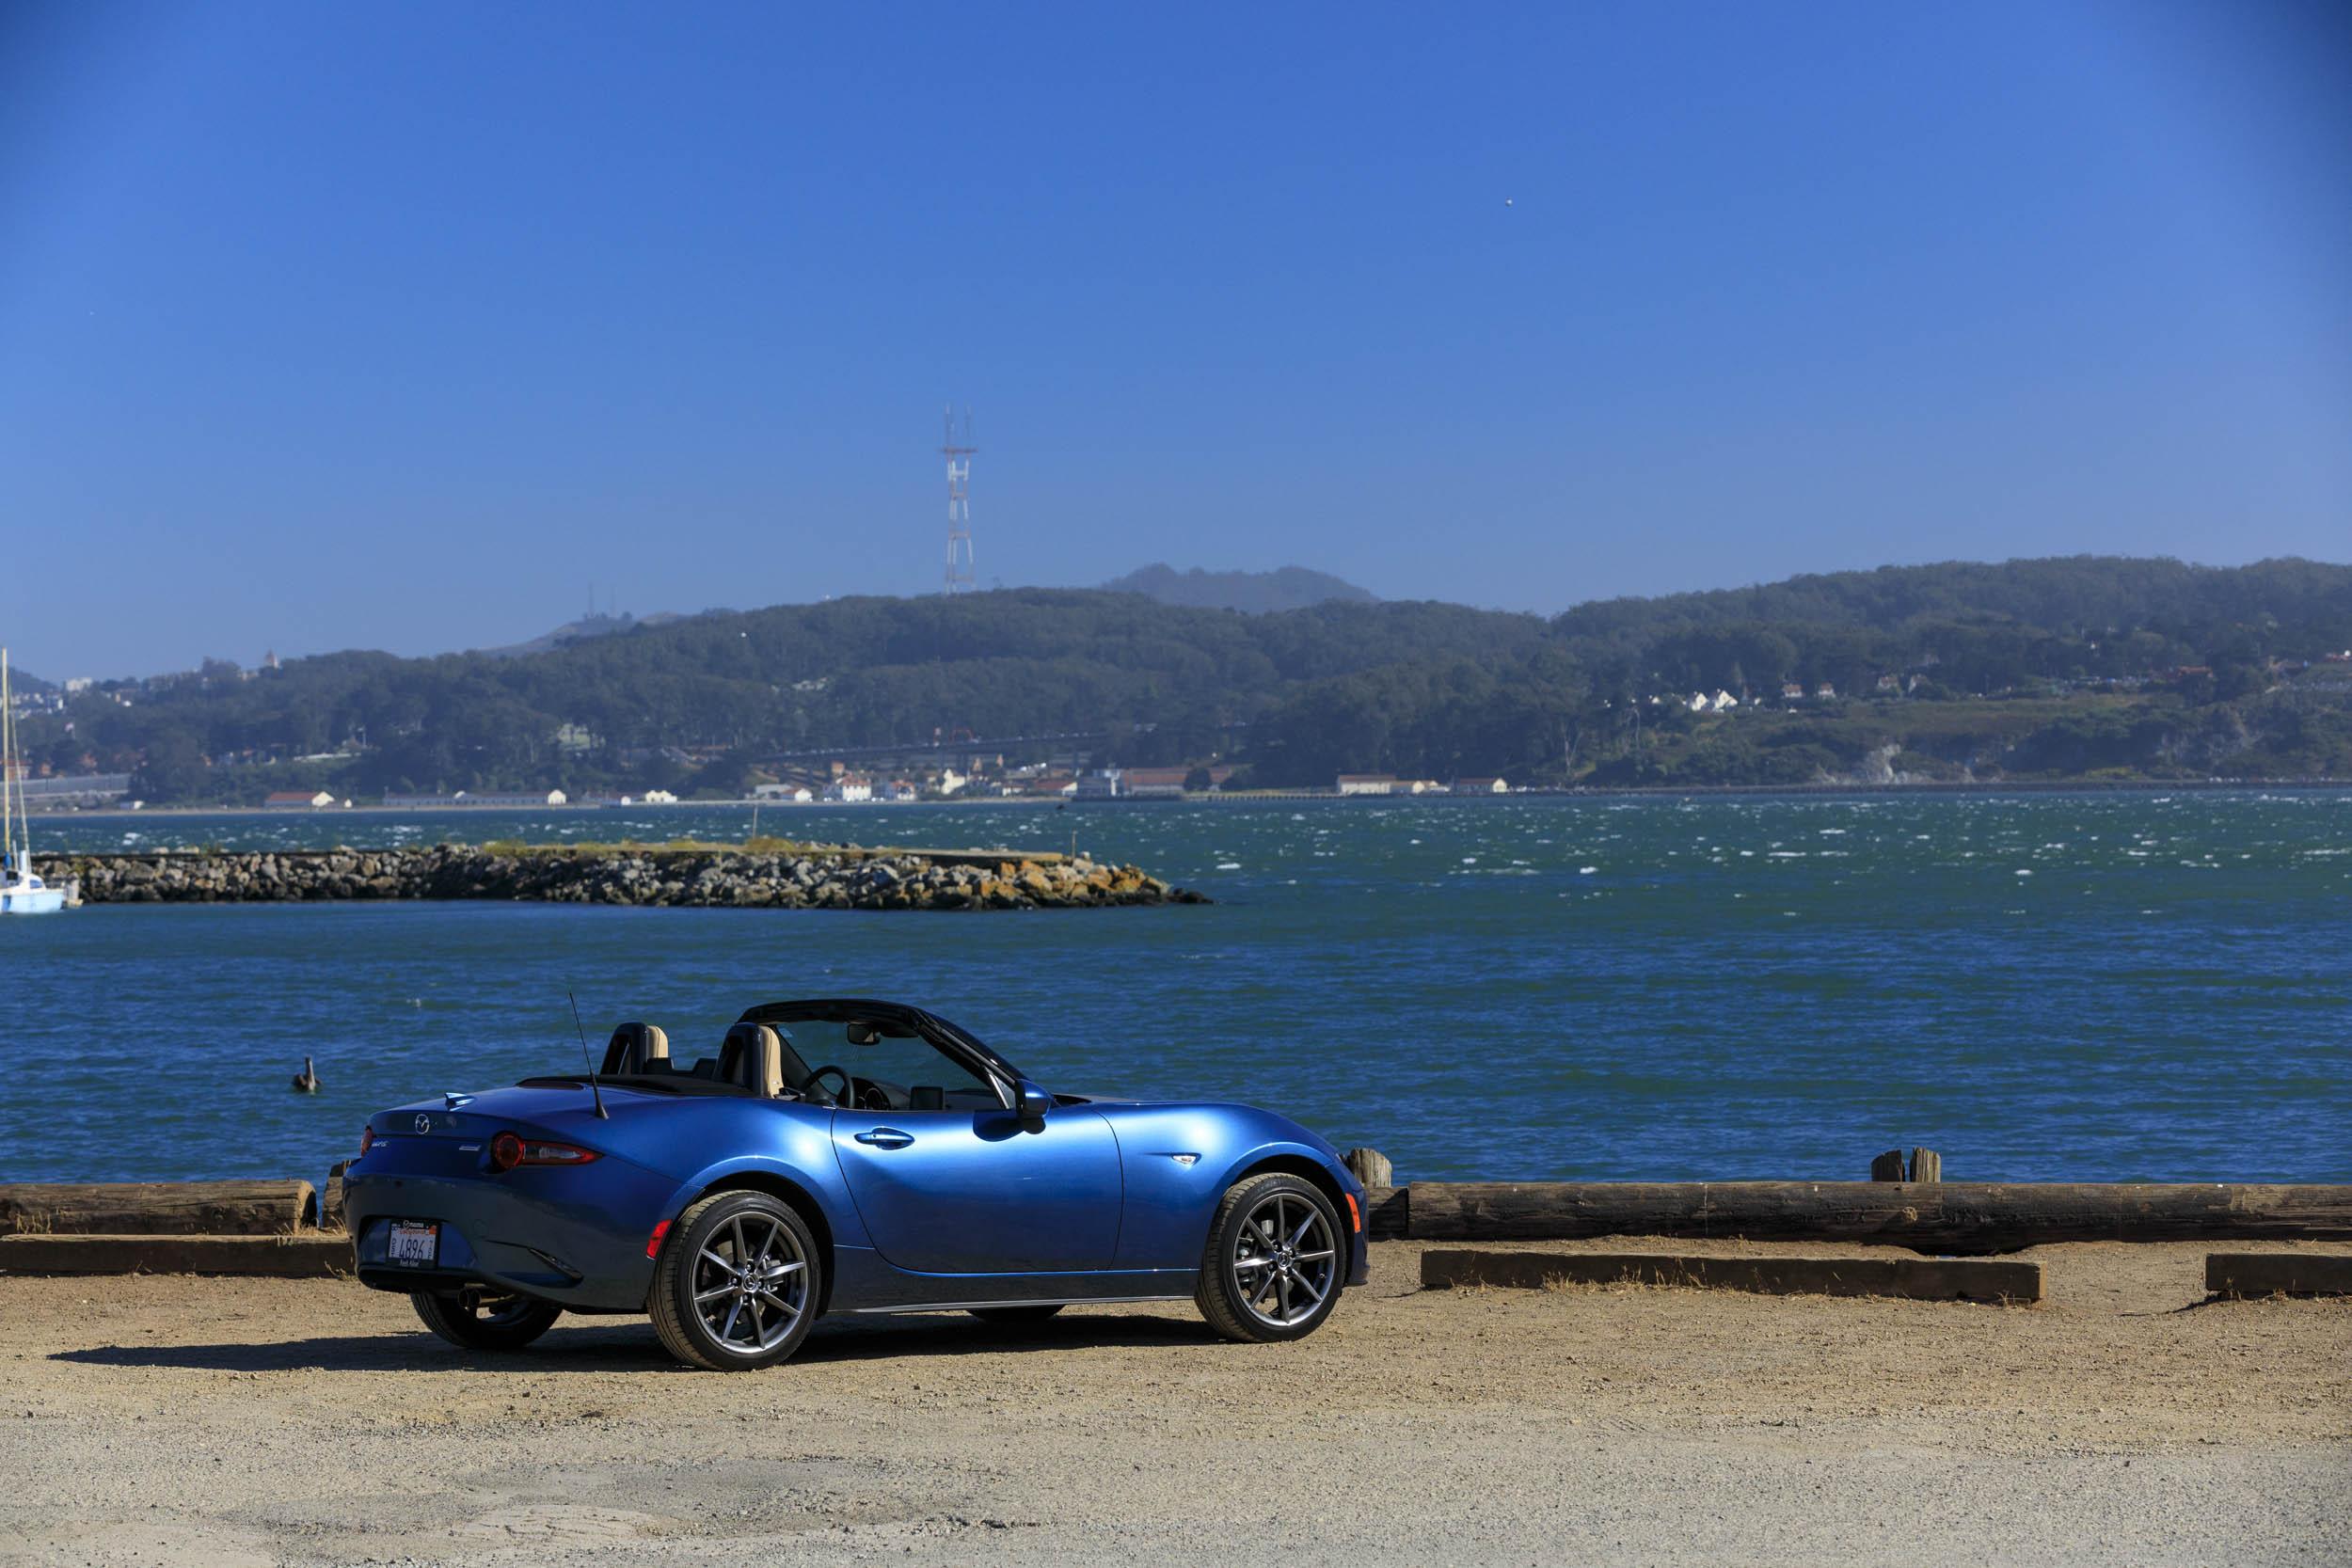 Blue 2019 Mazda MX-5 Miata